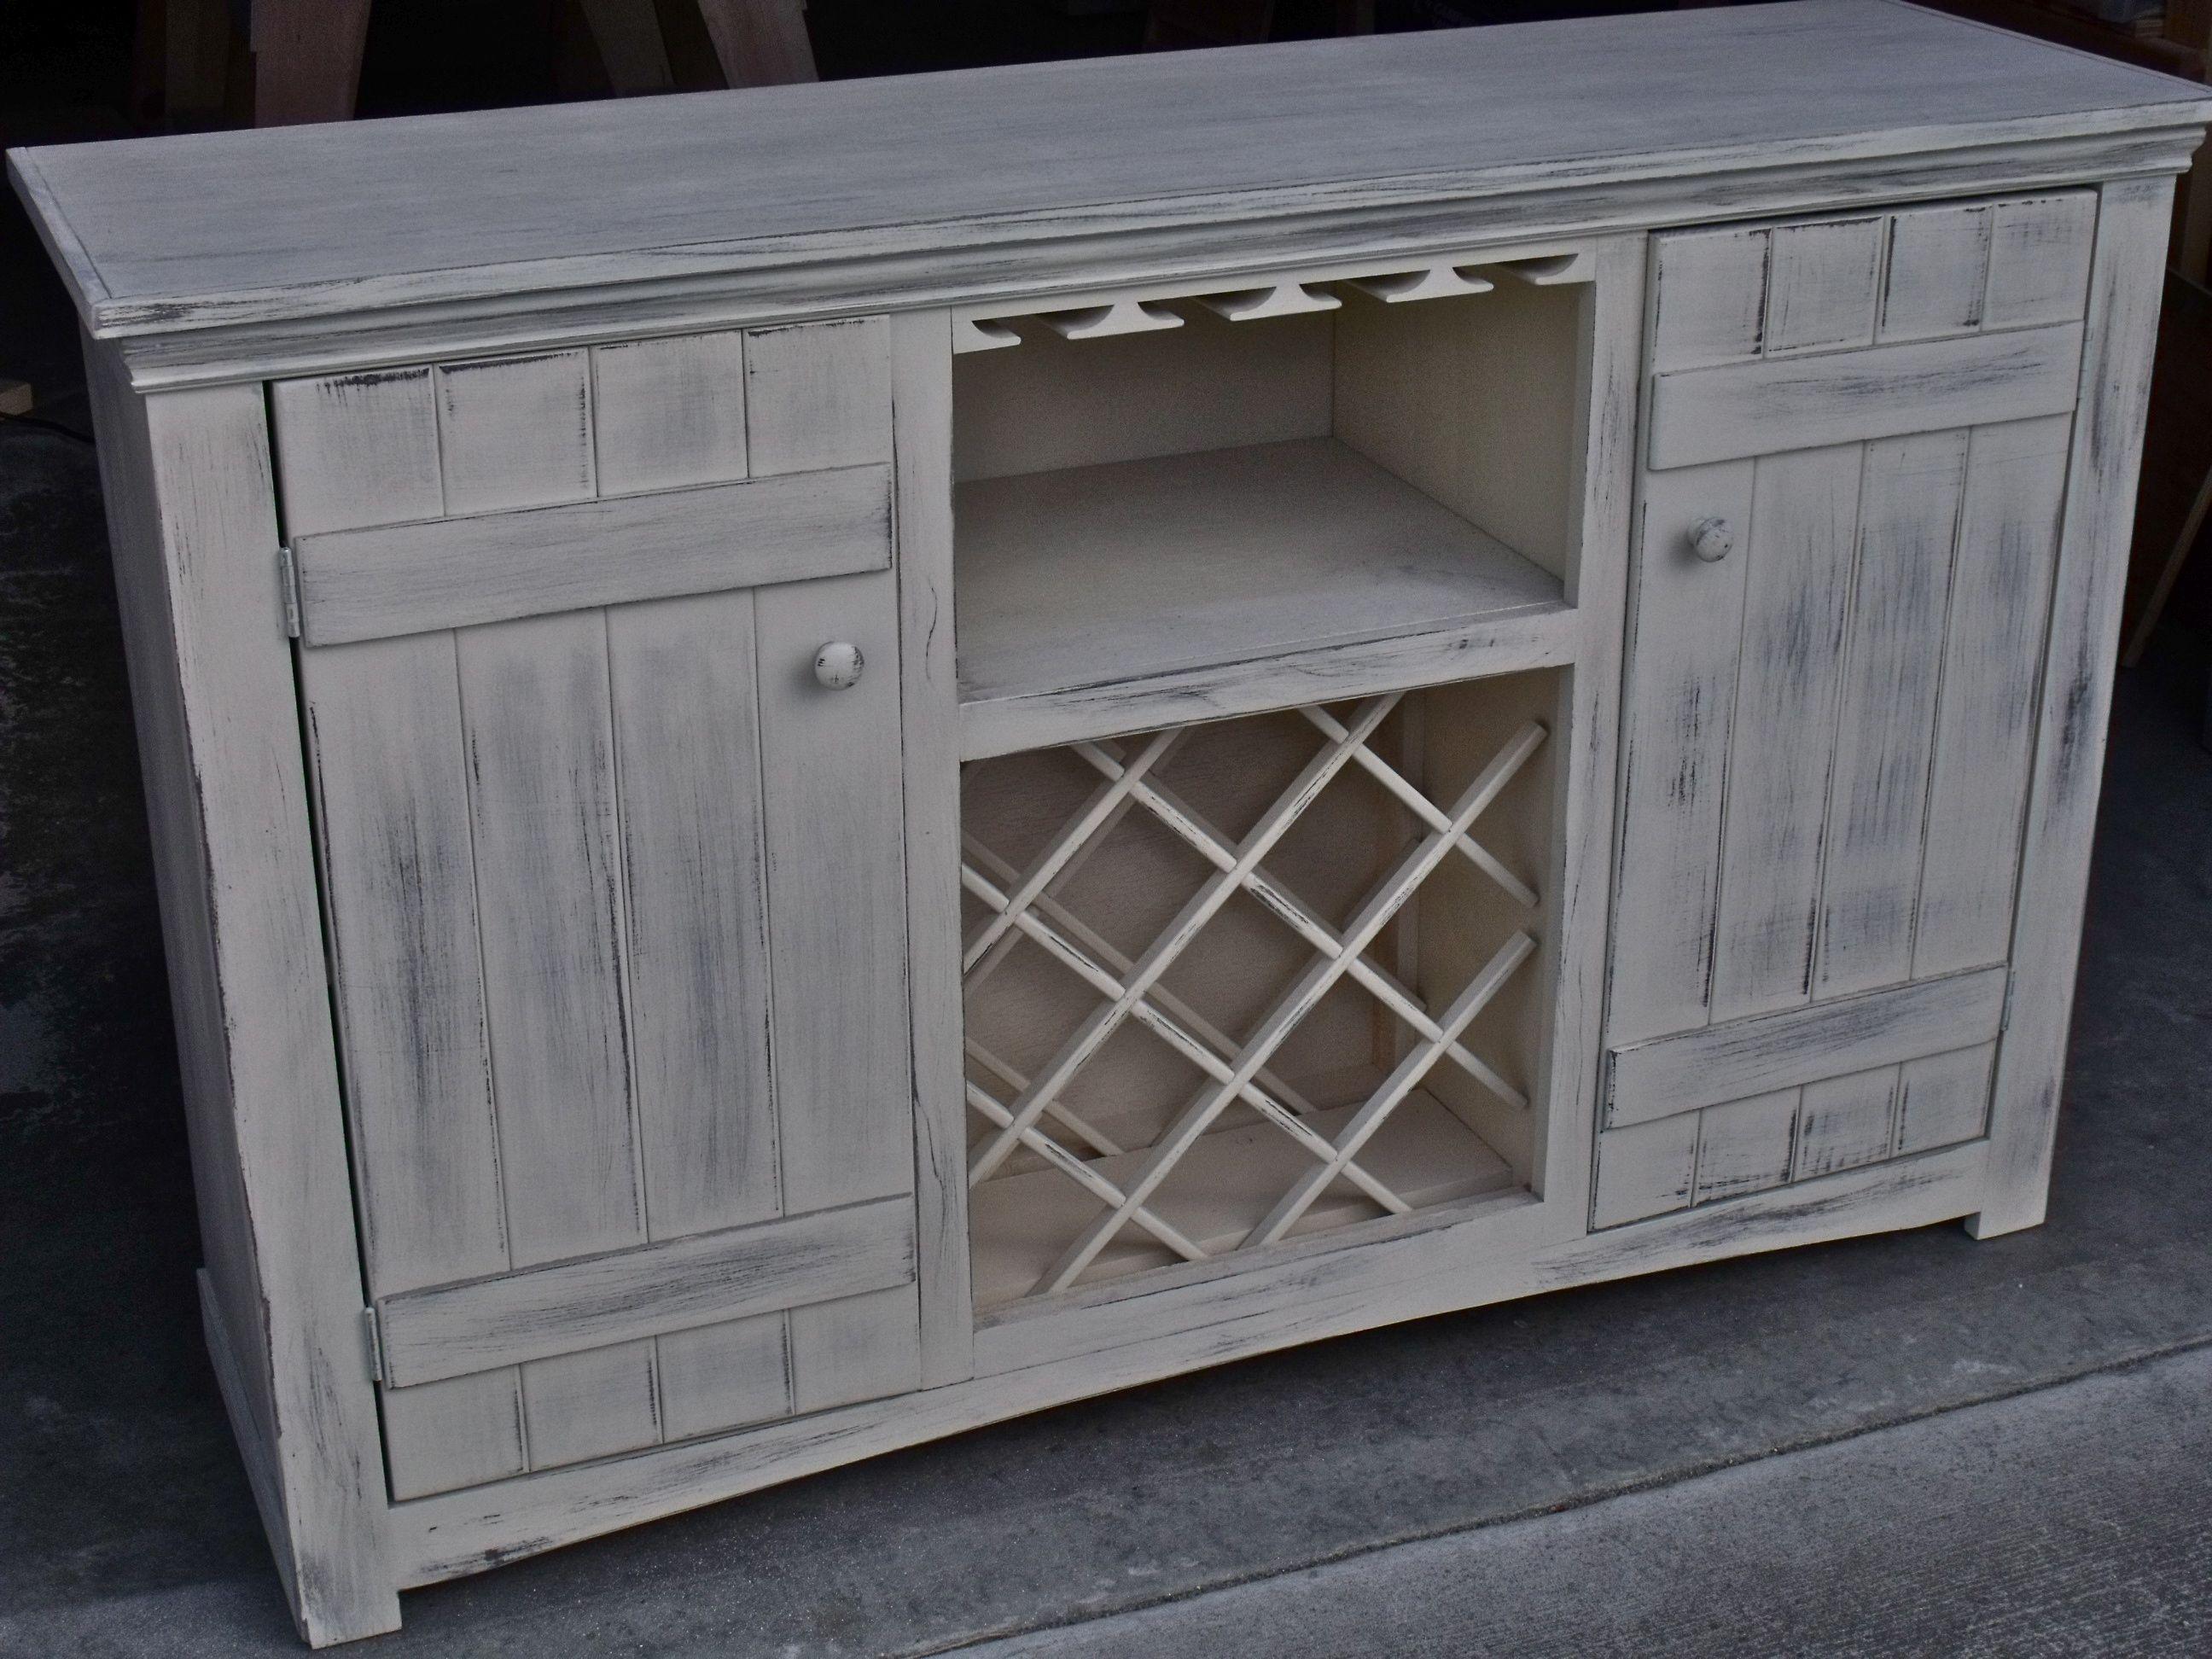 joss furniture vi reviews rustic cabinet bottle napoli pdp wine main floor